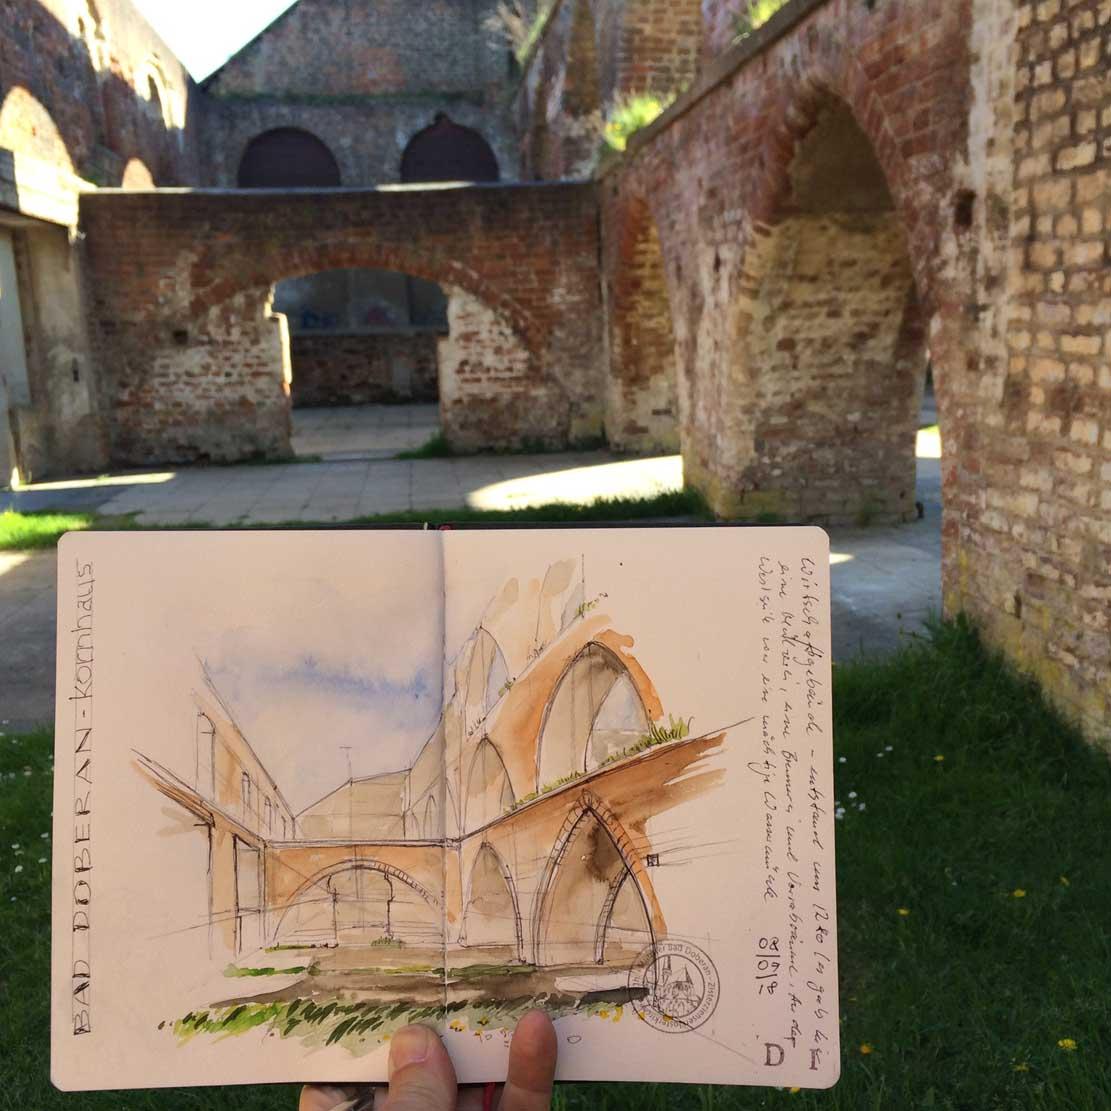 Klosterruine Bad Doberan - urban sketching Jens Hübner